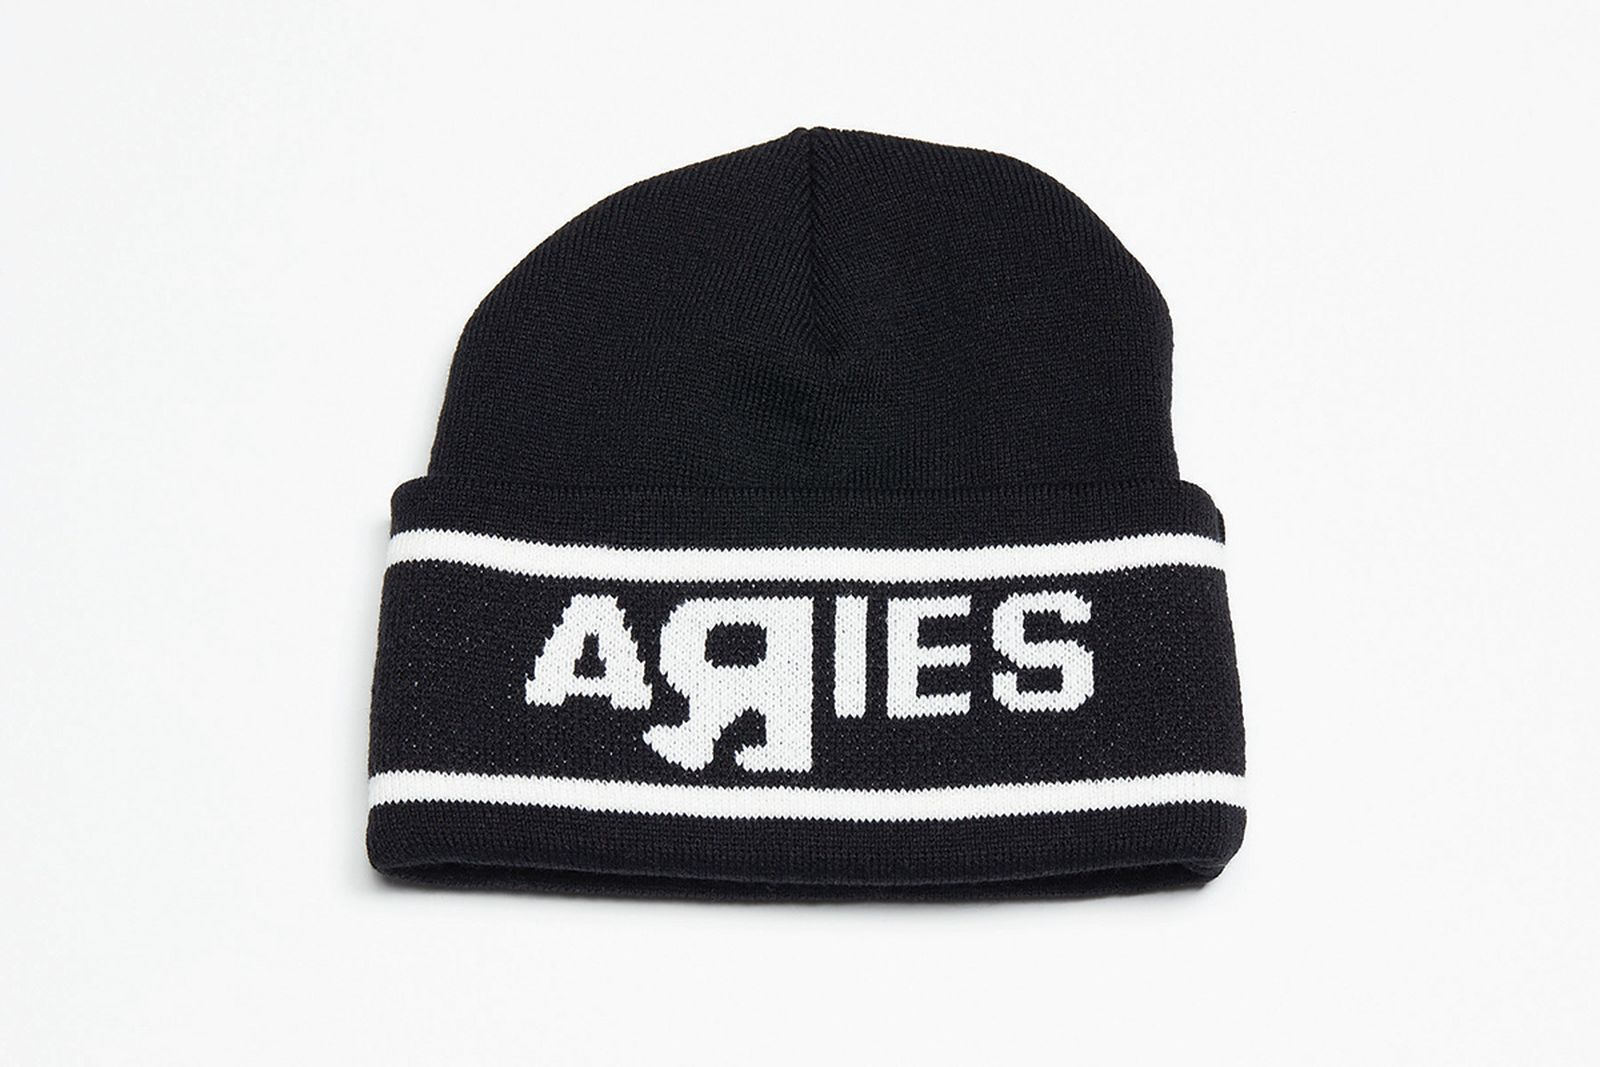 aries-vault-by-vans-go-your-own-way-release-date-price-10